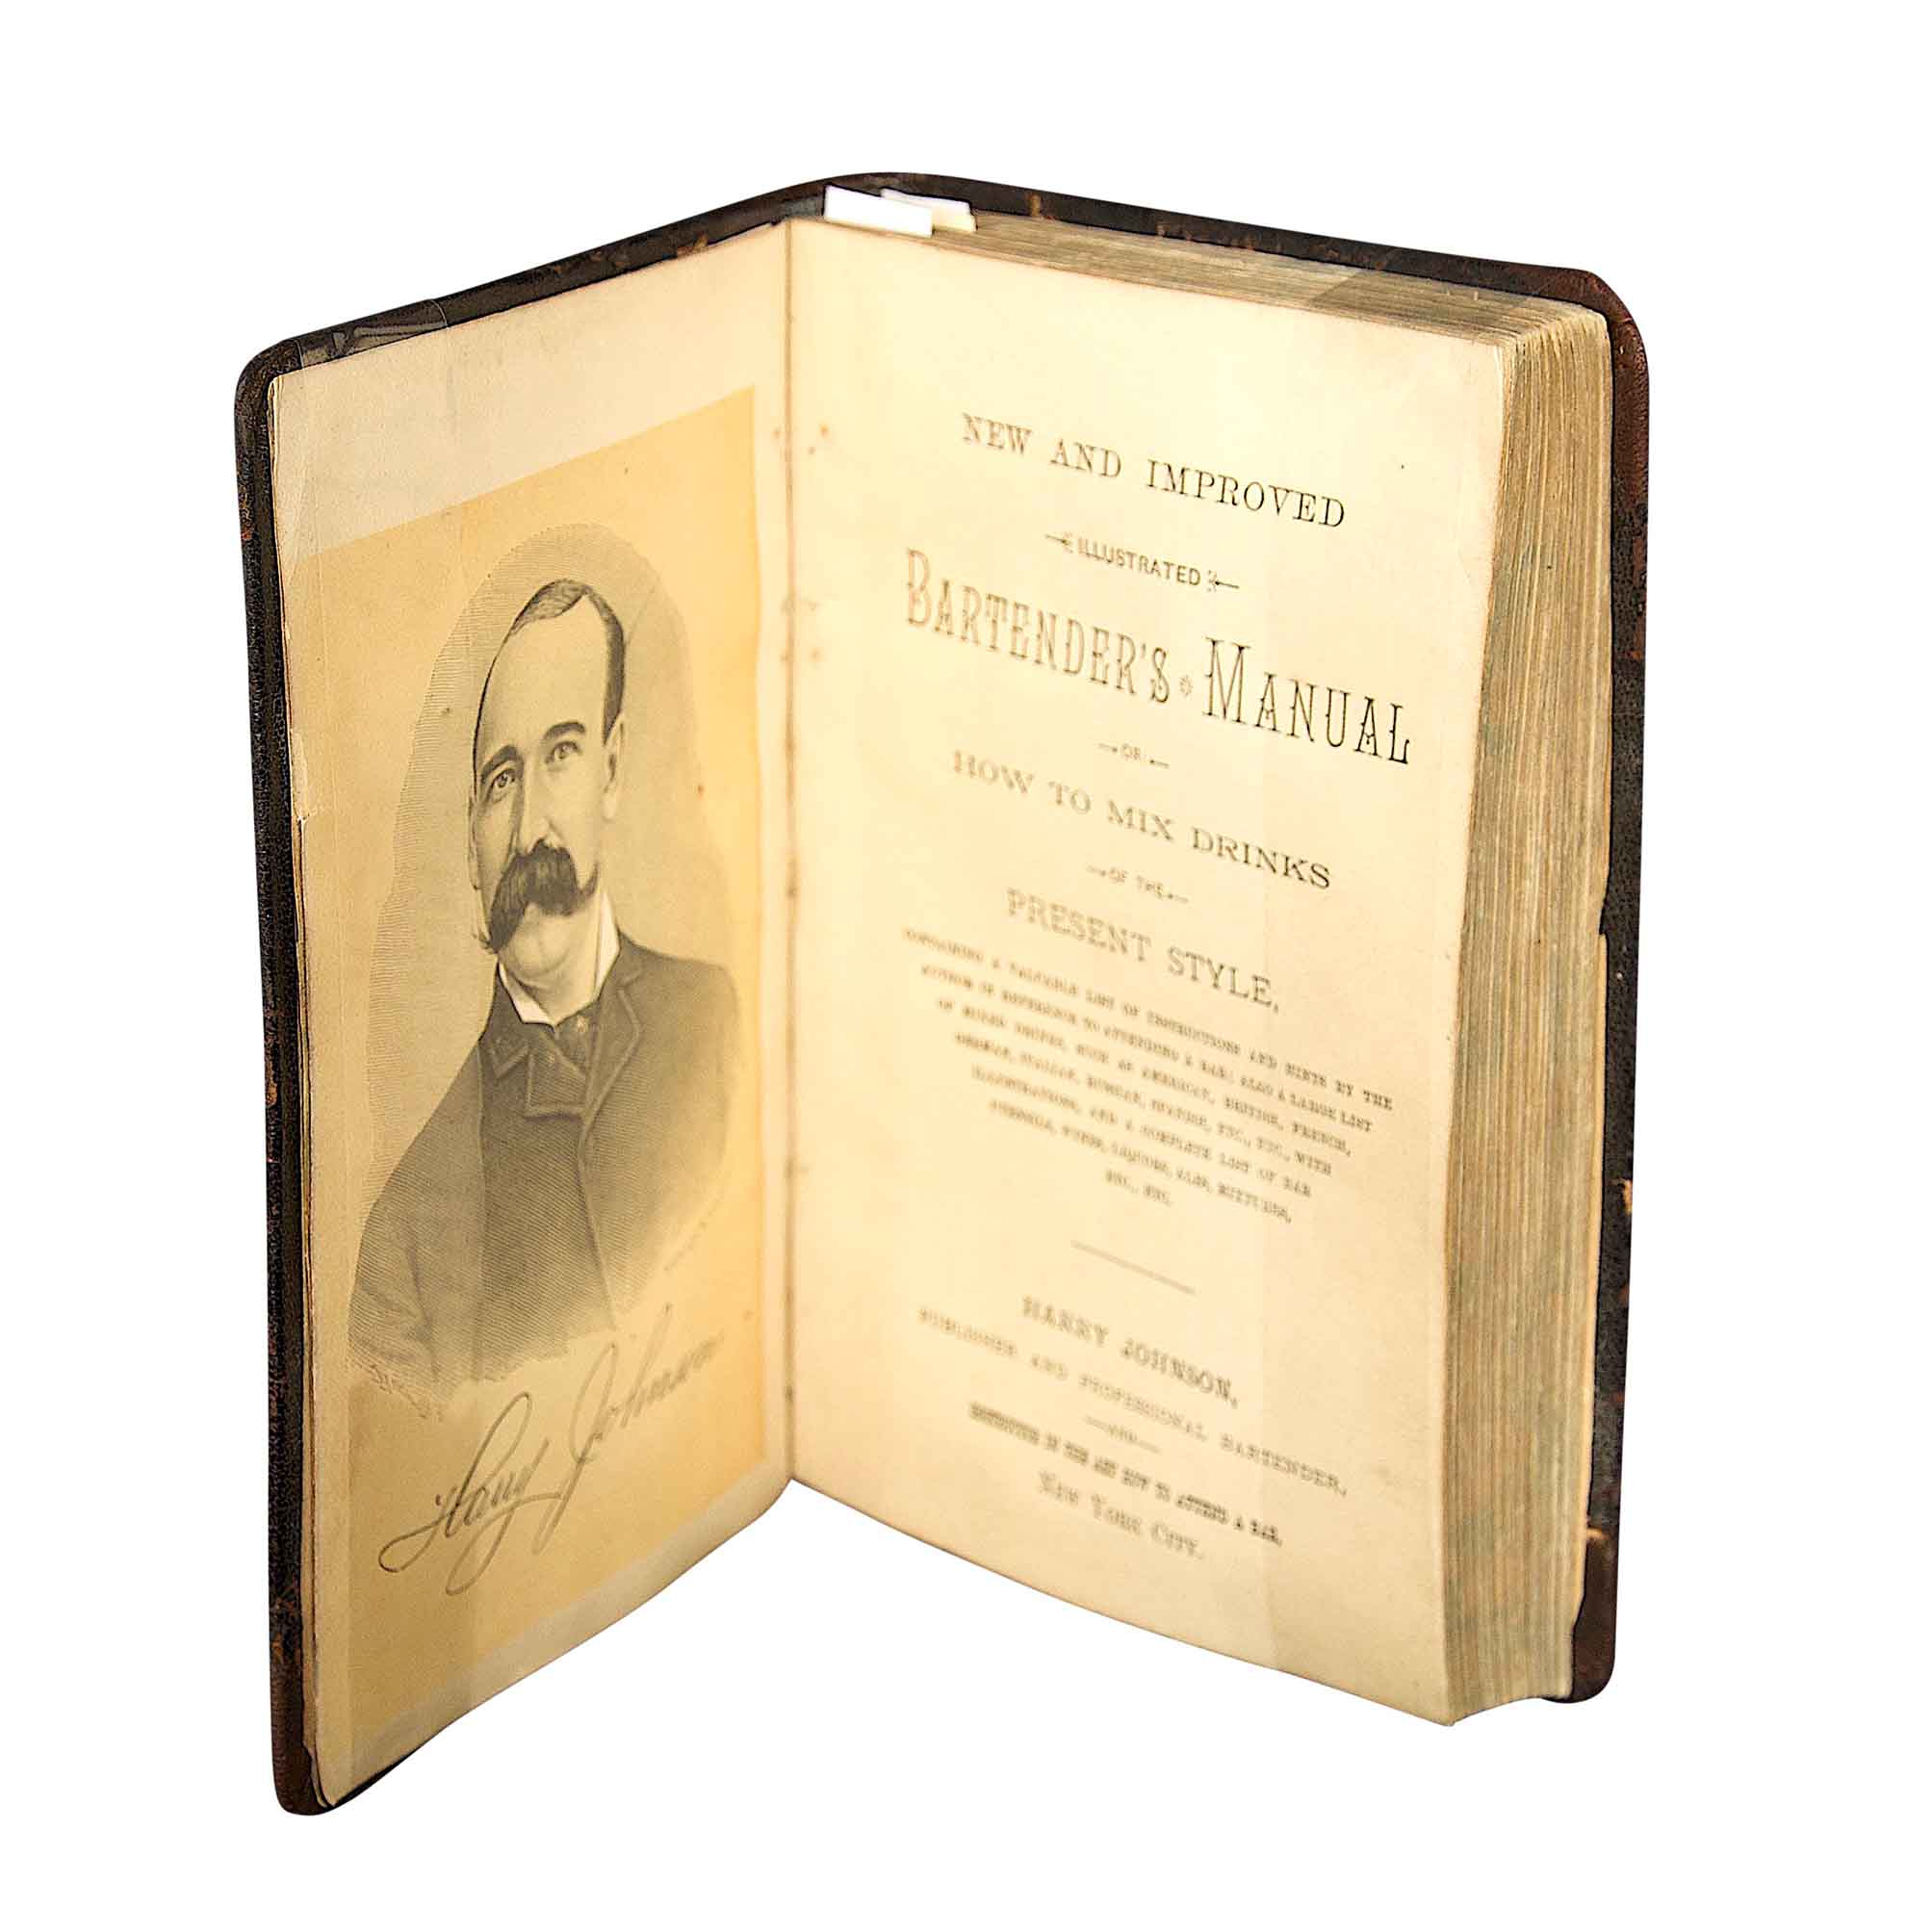 6083 Johnson Bartenders Manual 1888 Title 2 N